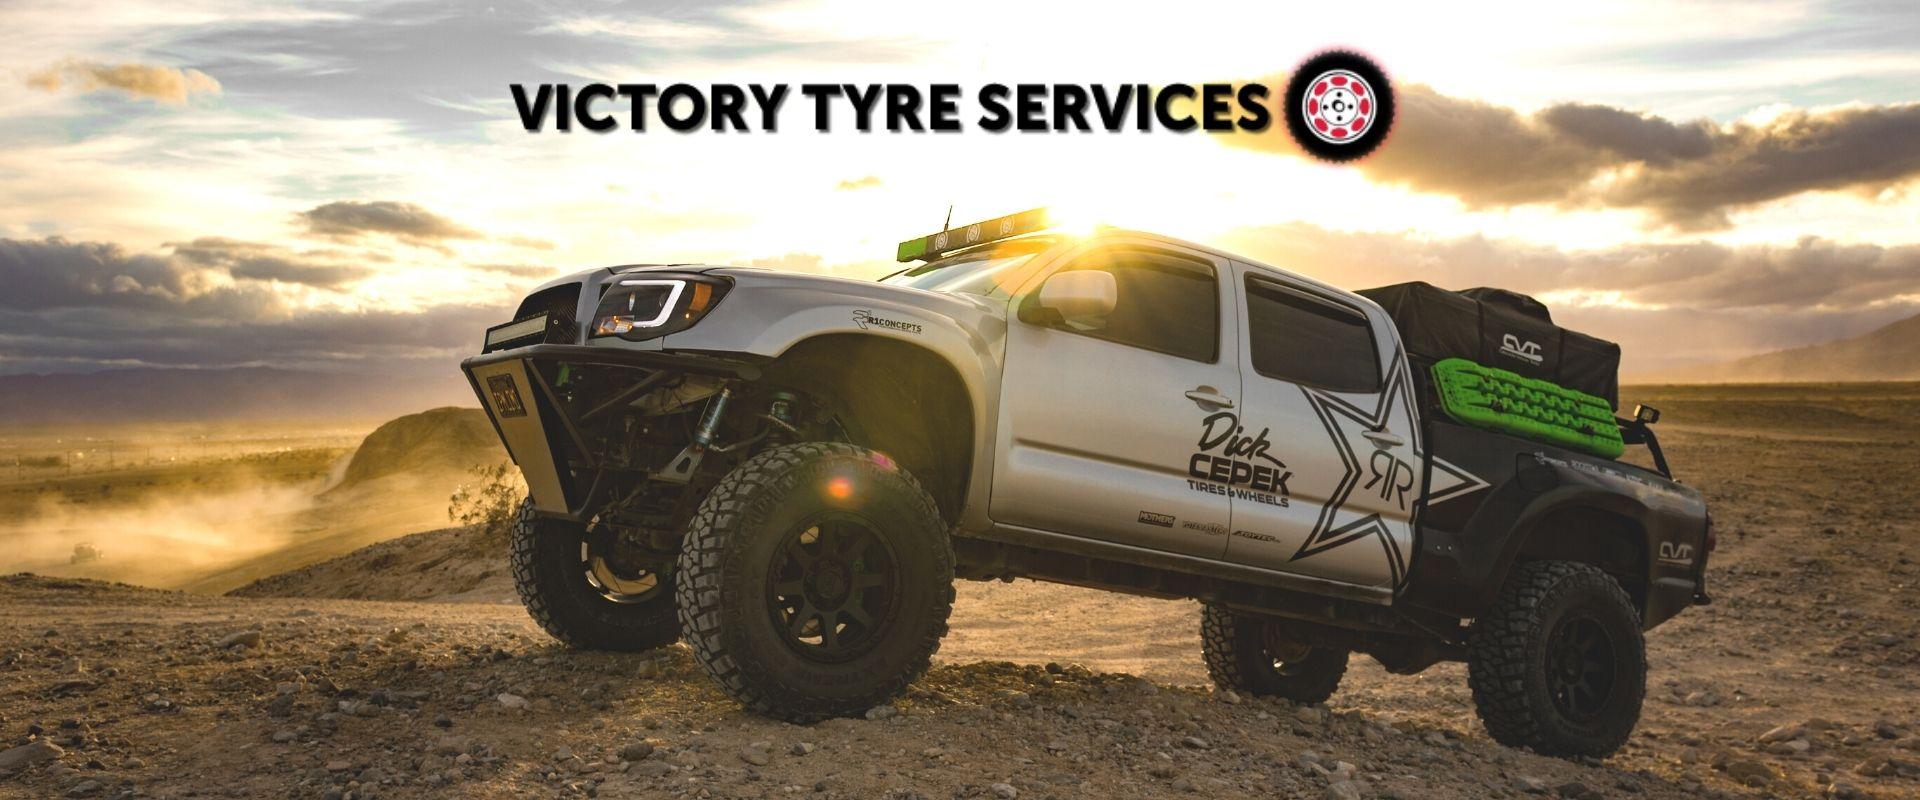 Tyres Services. Major Tyre Brands Gold Coast Tweed Heads